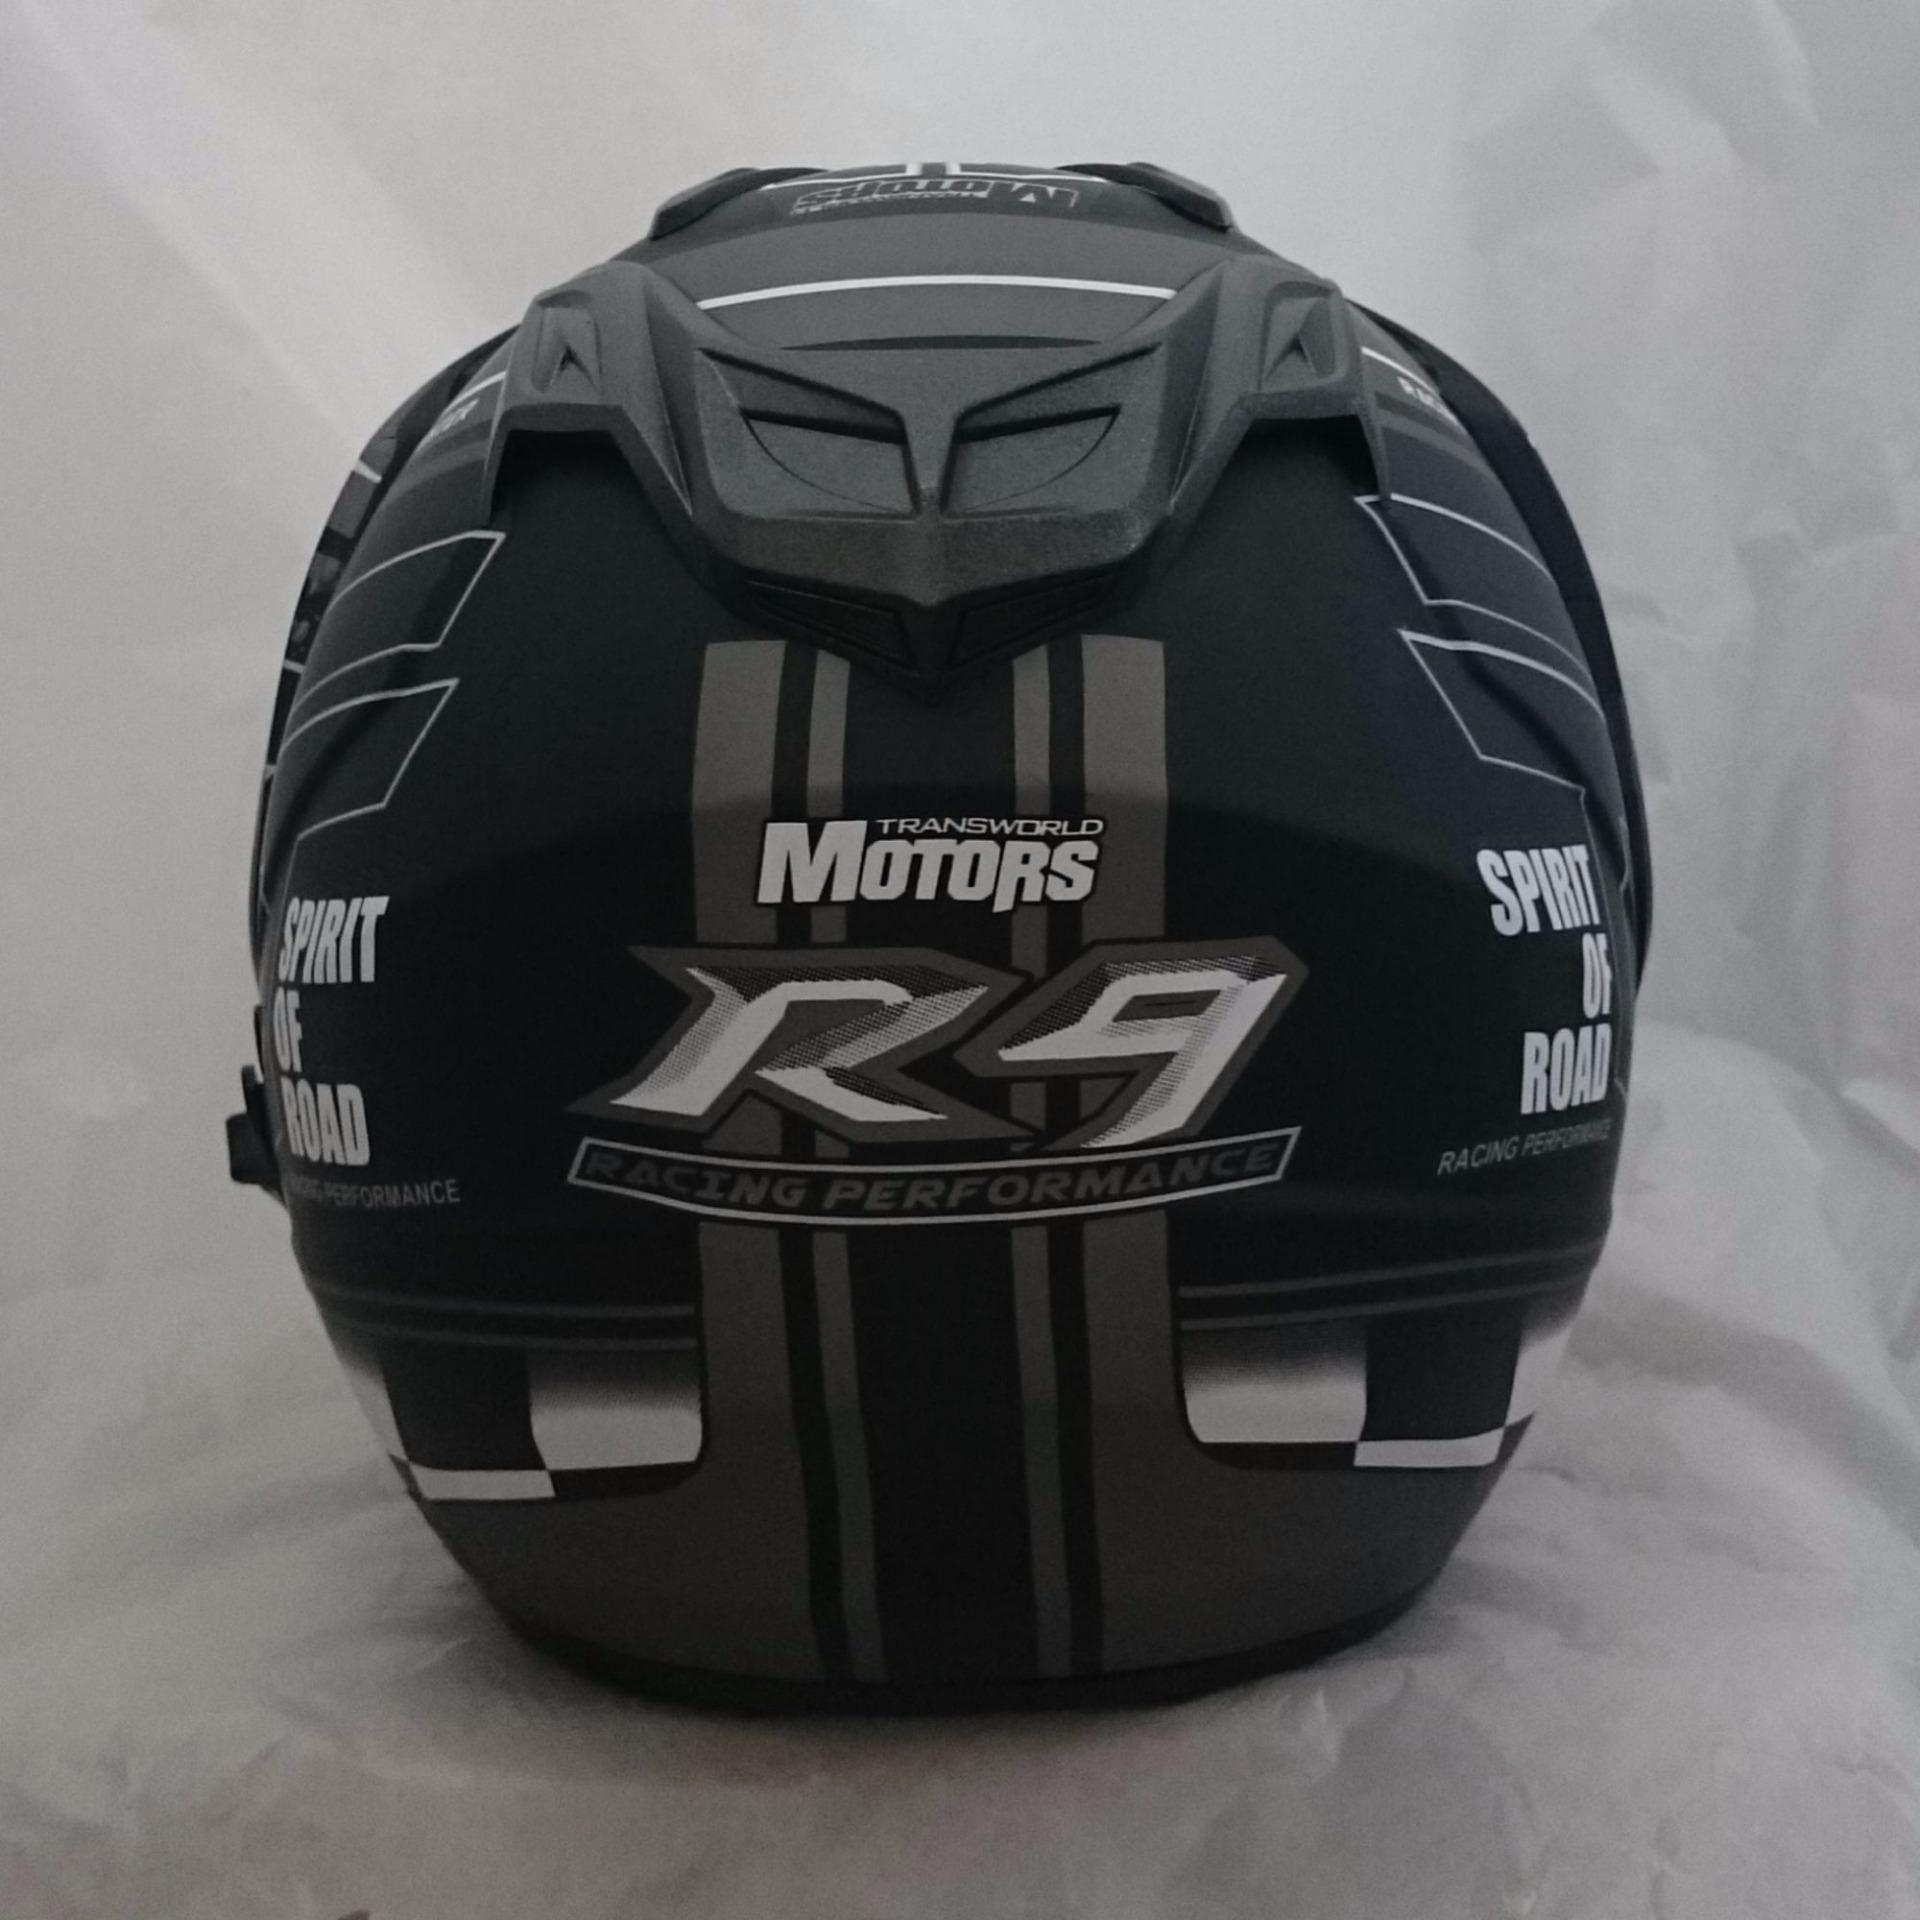 Flash Sale Helm 2 Kaca Dmn R 9 Black Doff Abu Harga Baru Double Visor  Sport Orange